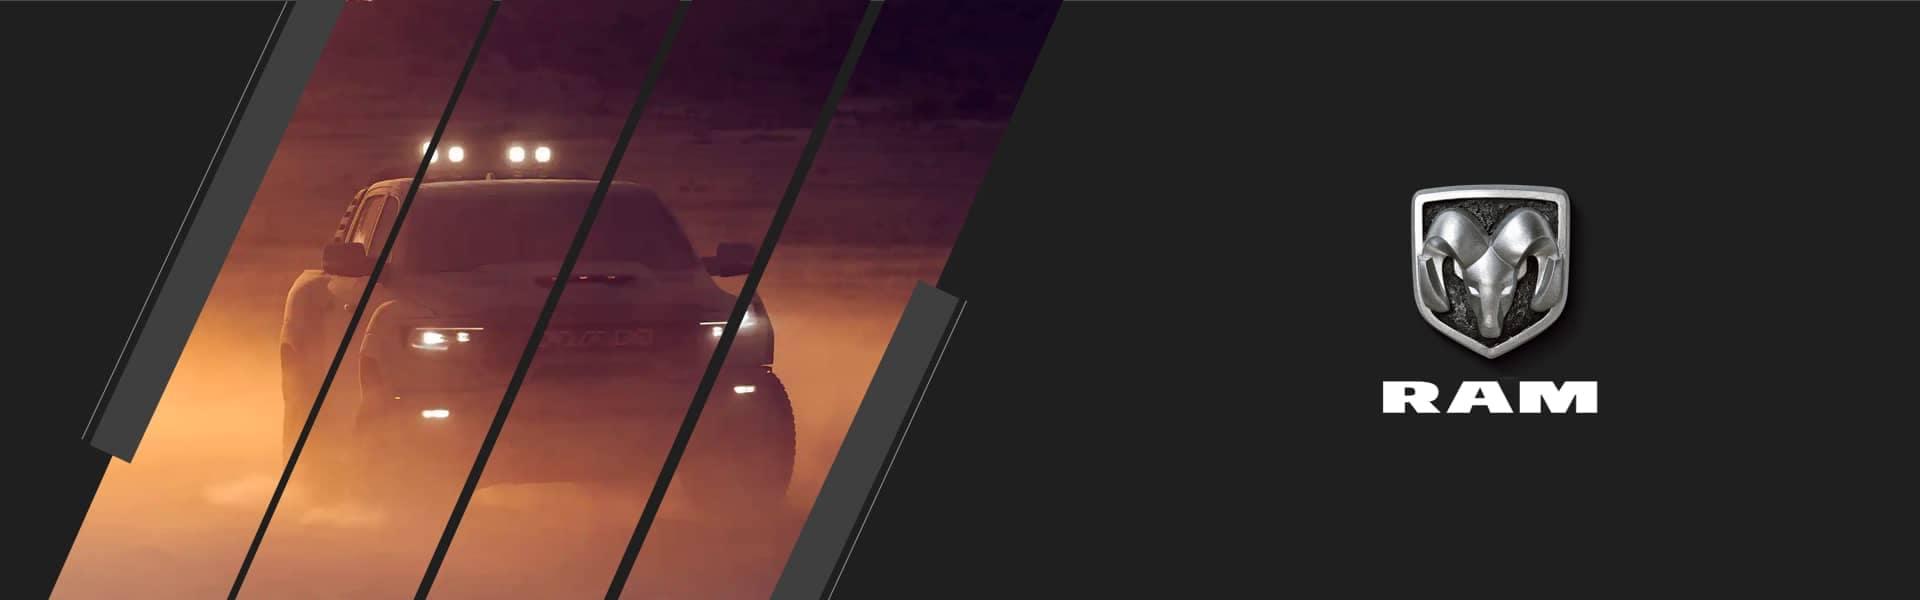 RAM Banner Image - Truck speeding through desert